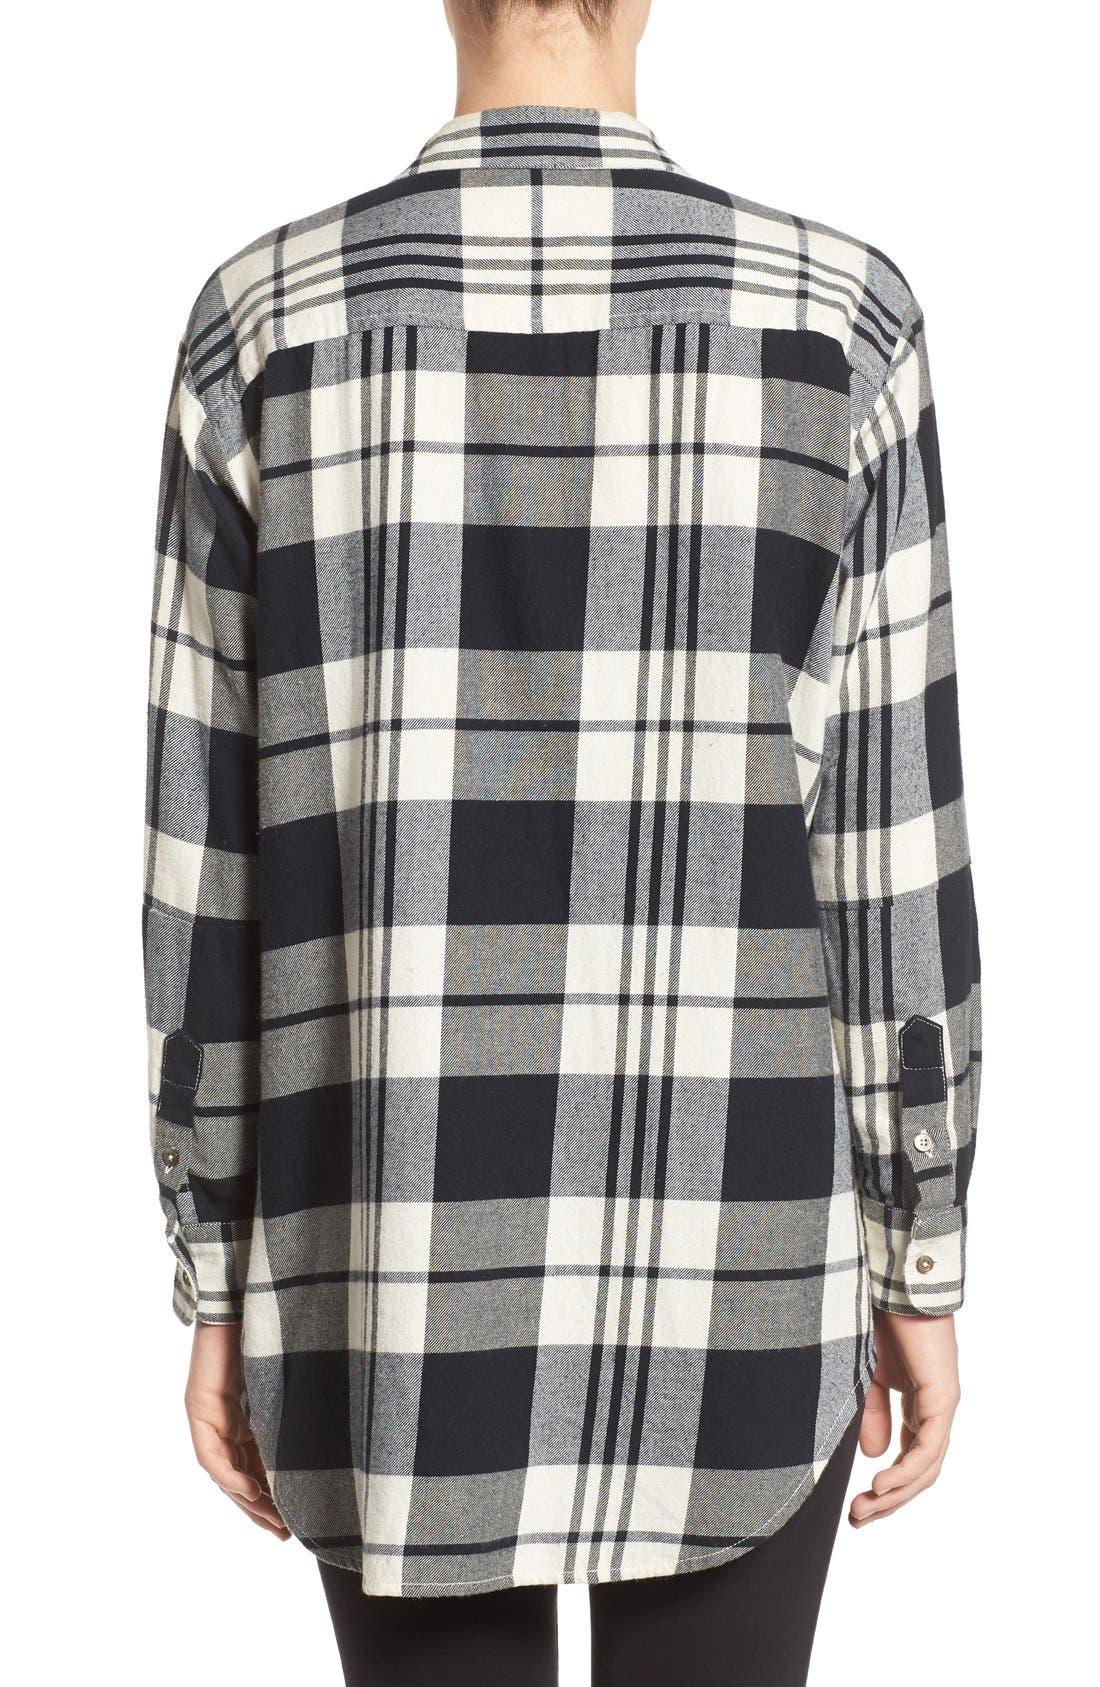 Alternate Image 2  - Madewell 'Ex Boyfriend' Plaid Oversize Cotton Shirt